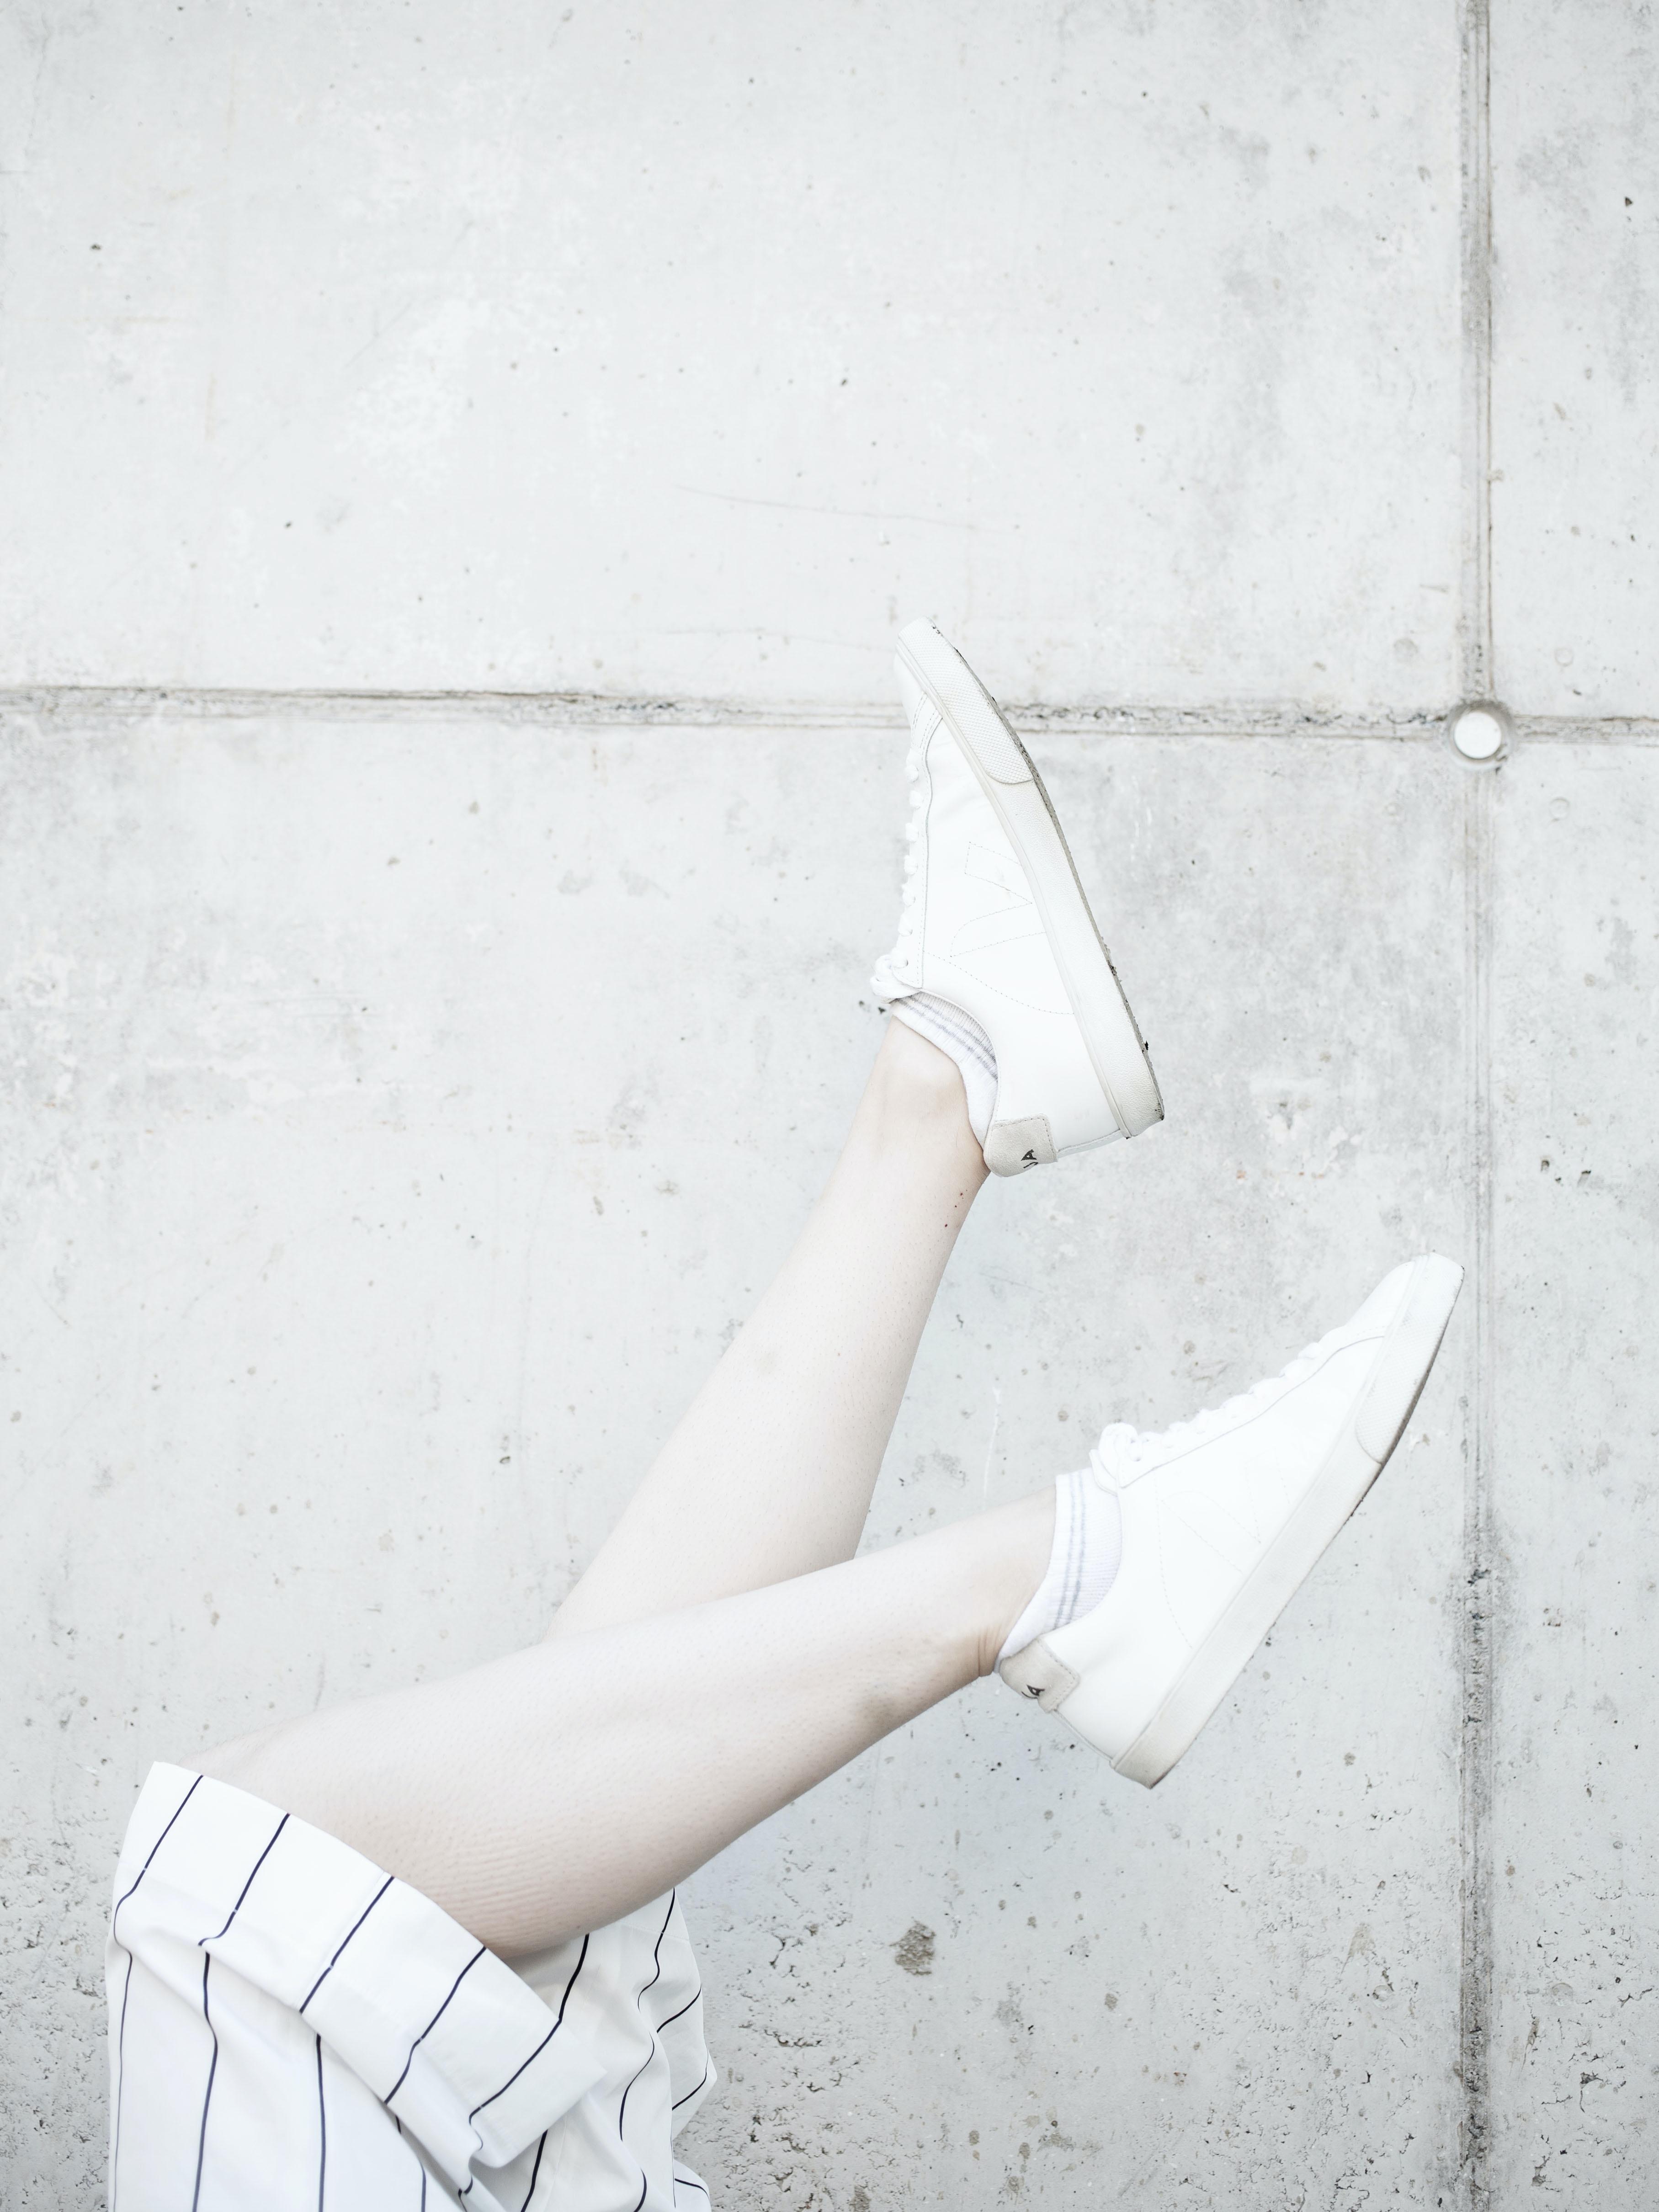 person raising its foots near wall